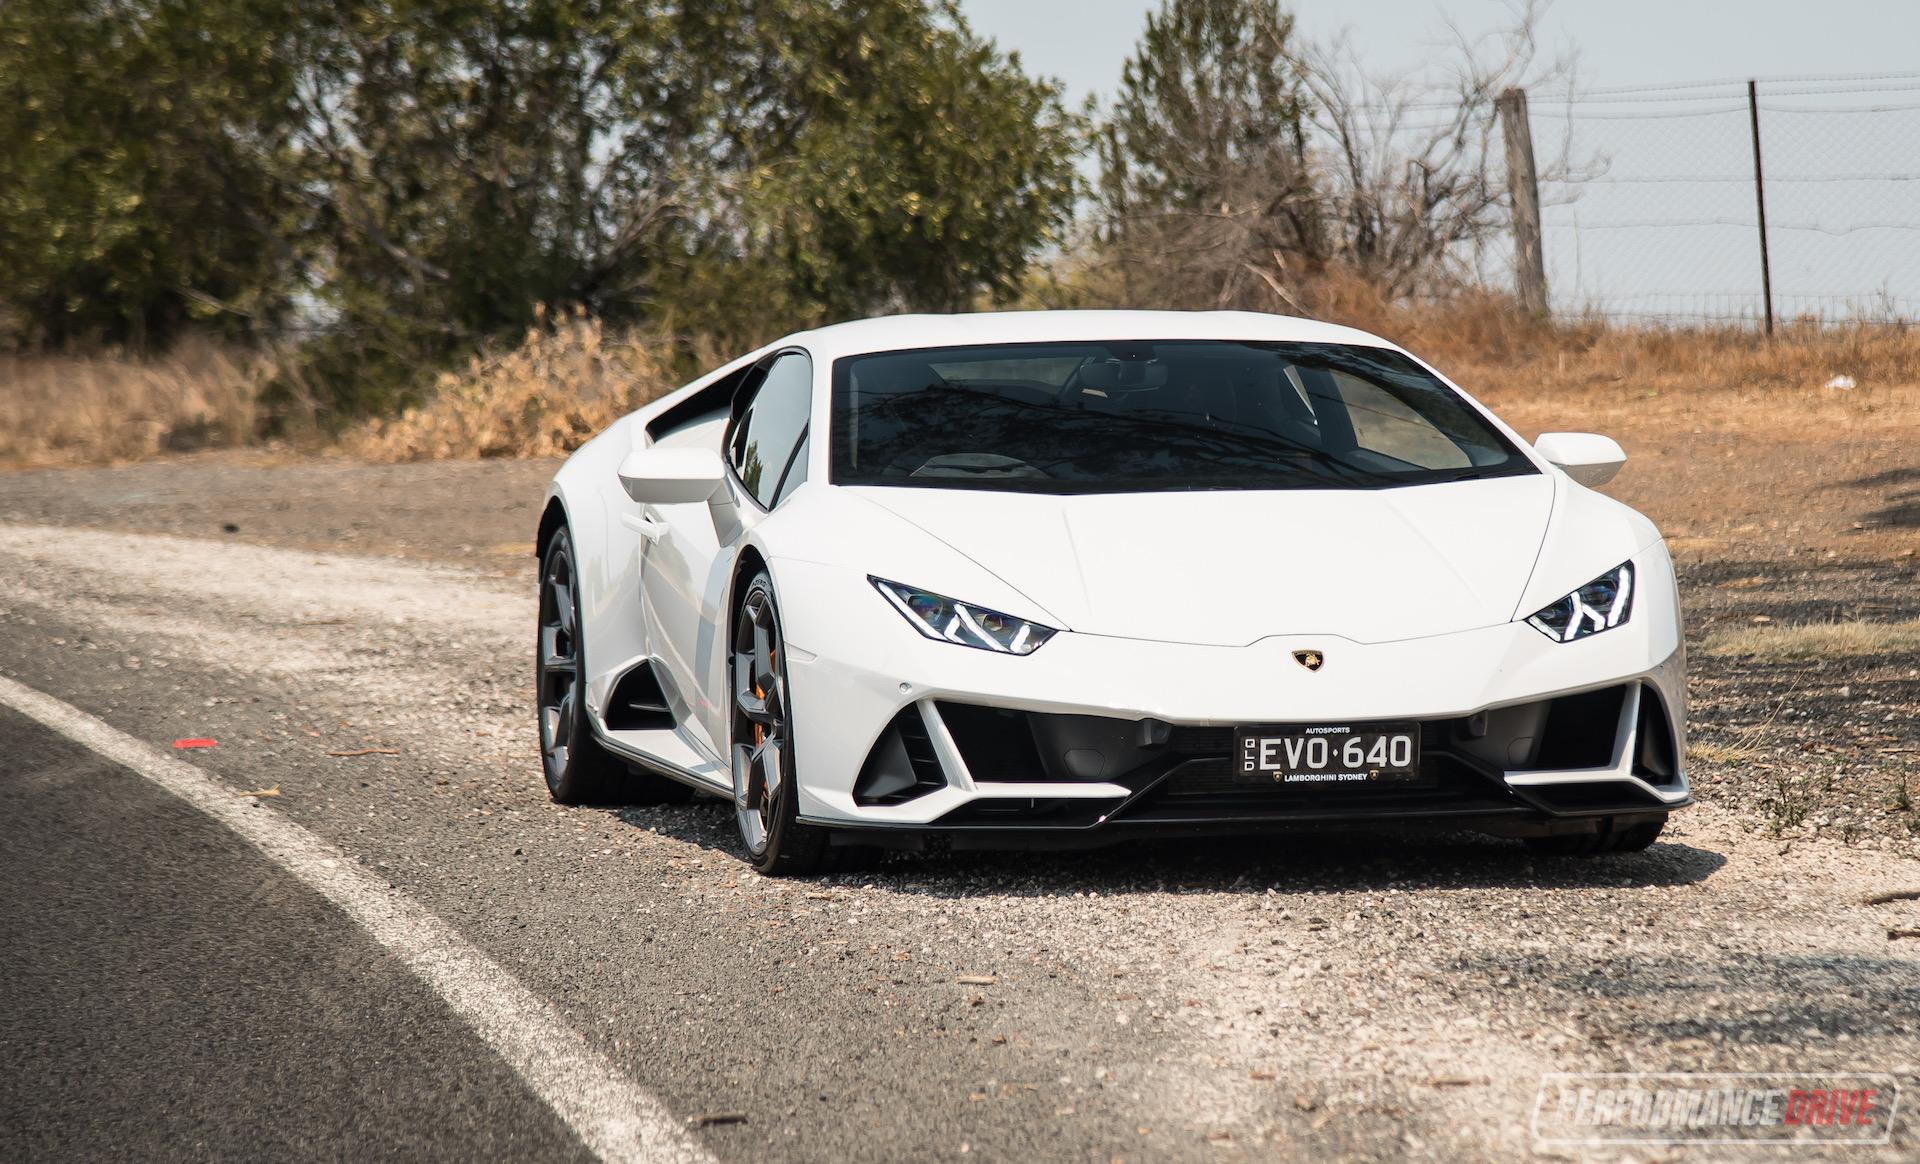 2020 Lamborghini Huracan Evo Review Video Performancedrive